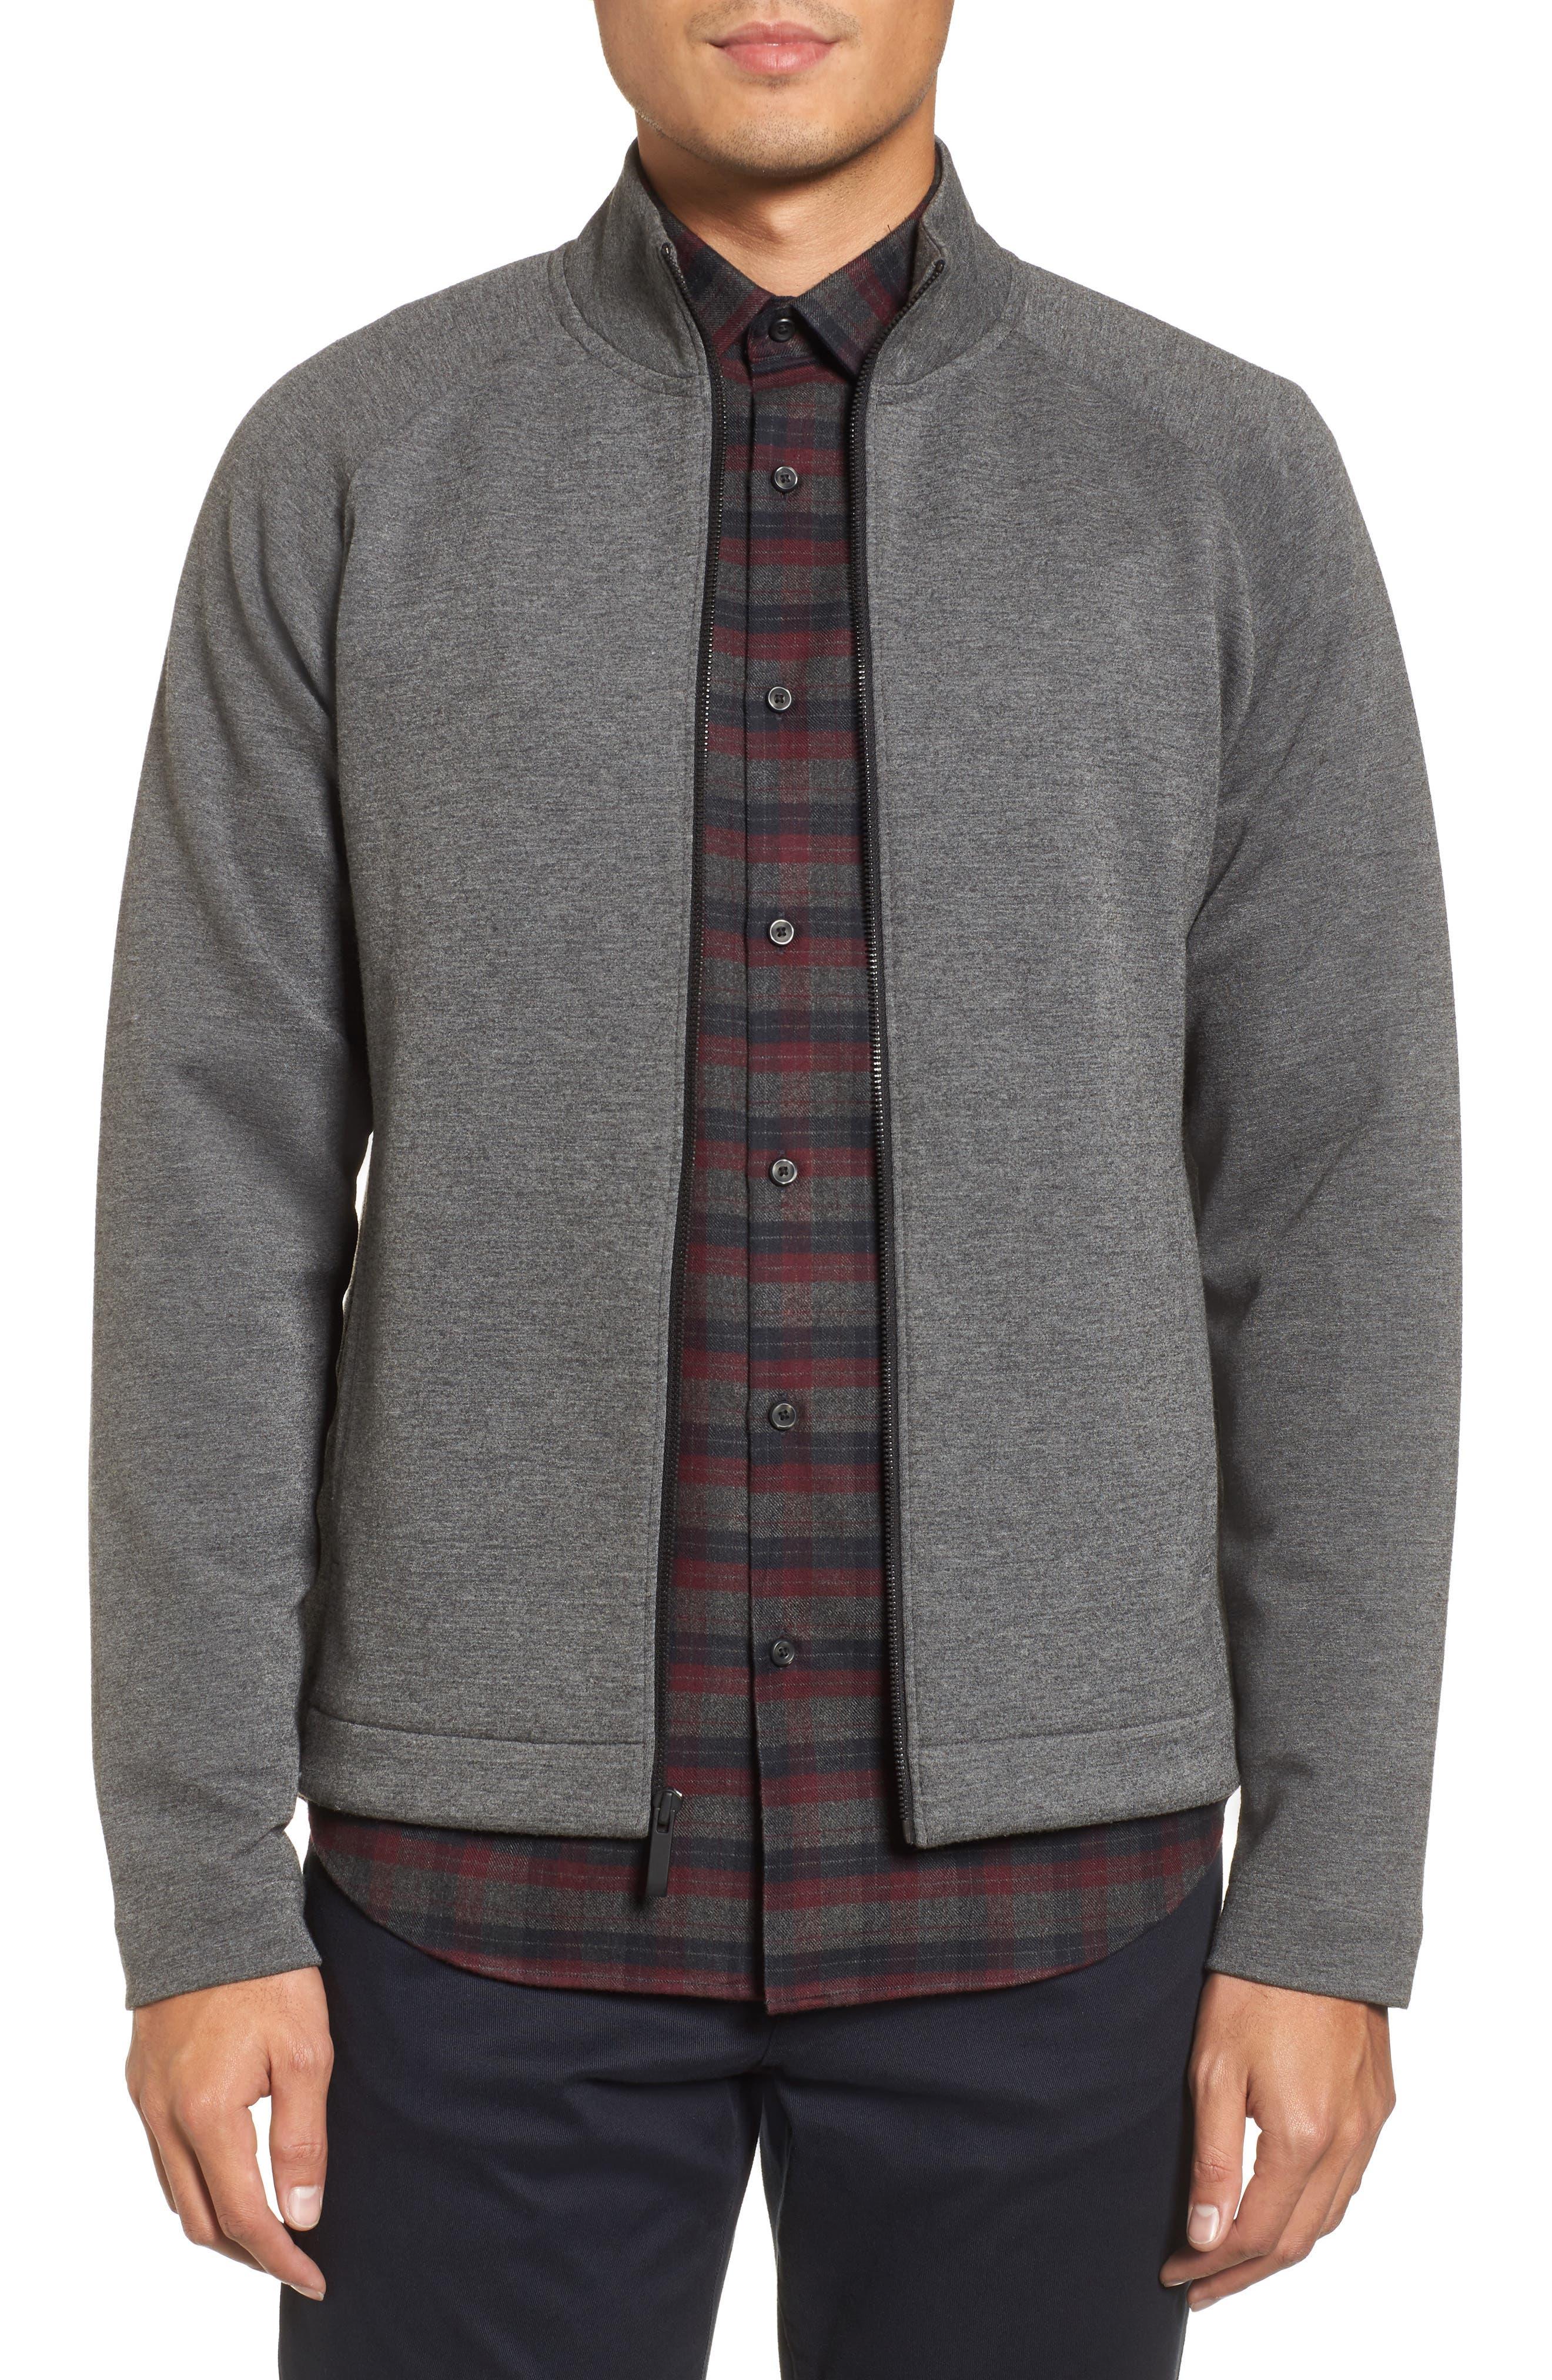 Fleece Jacket,                         Main,                         color, Grey Magnet Heather